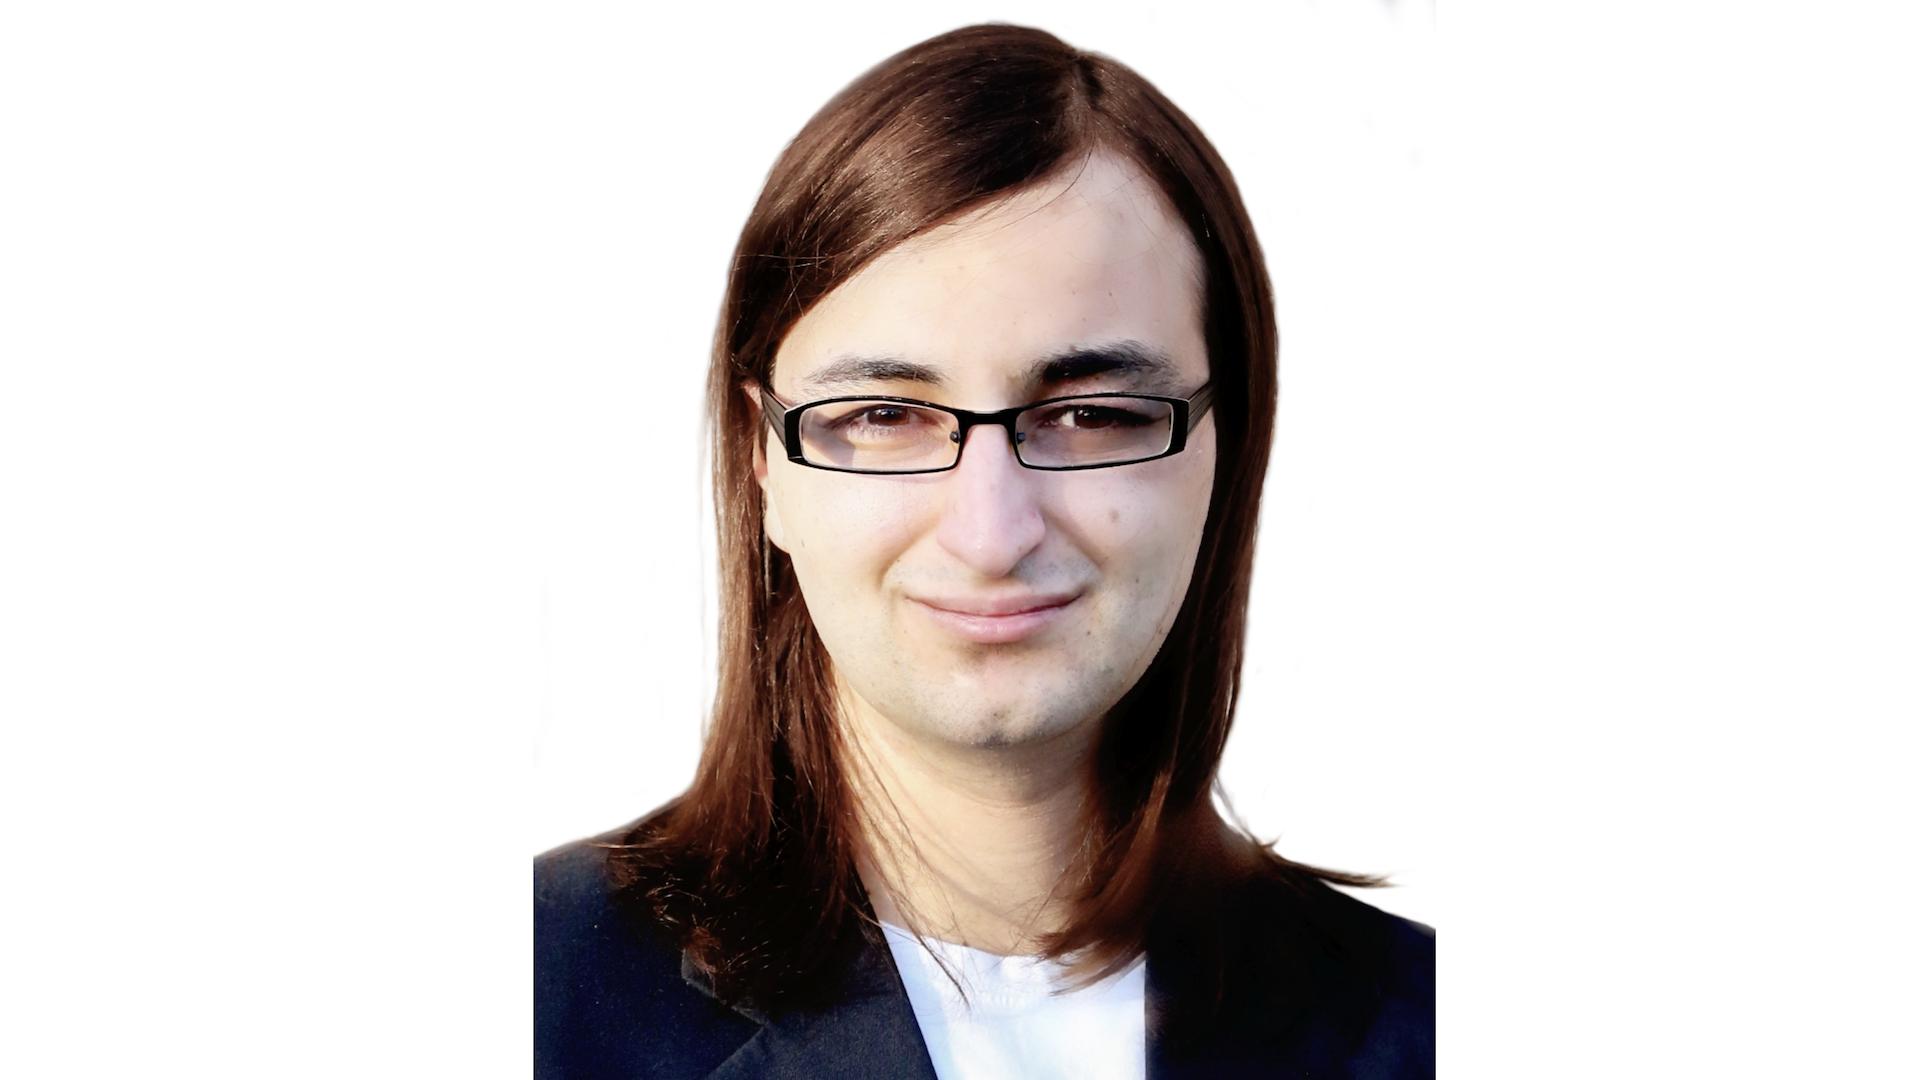 Tyler Delaat wears glasses a white shirt and dark blazer.